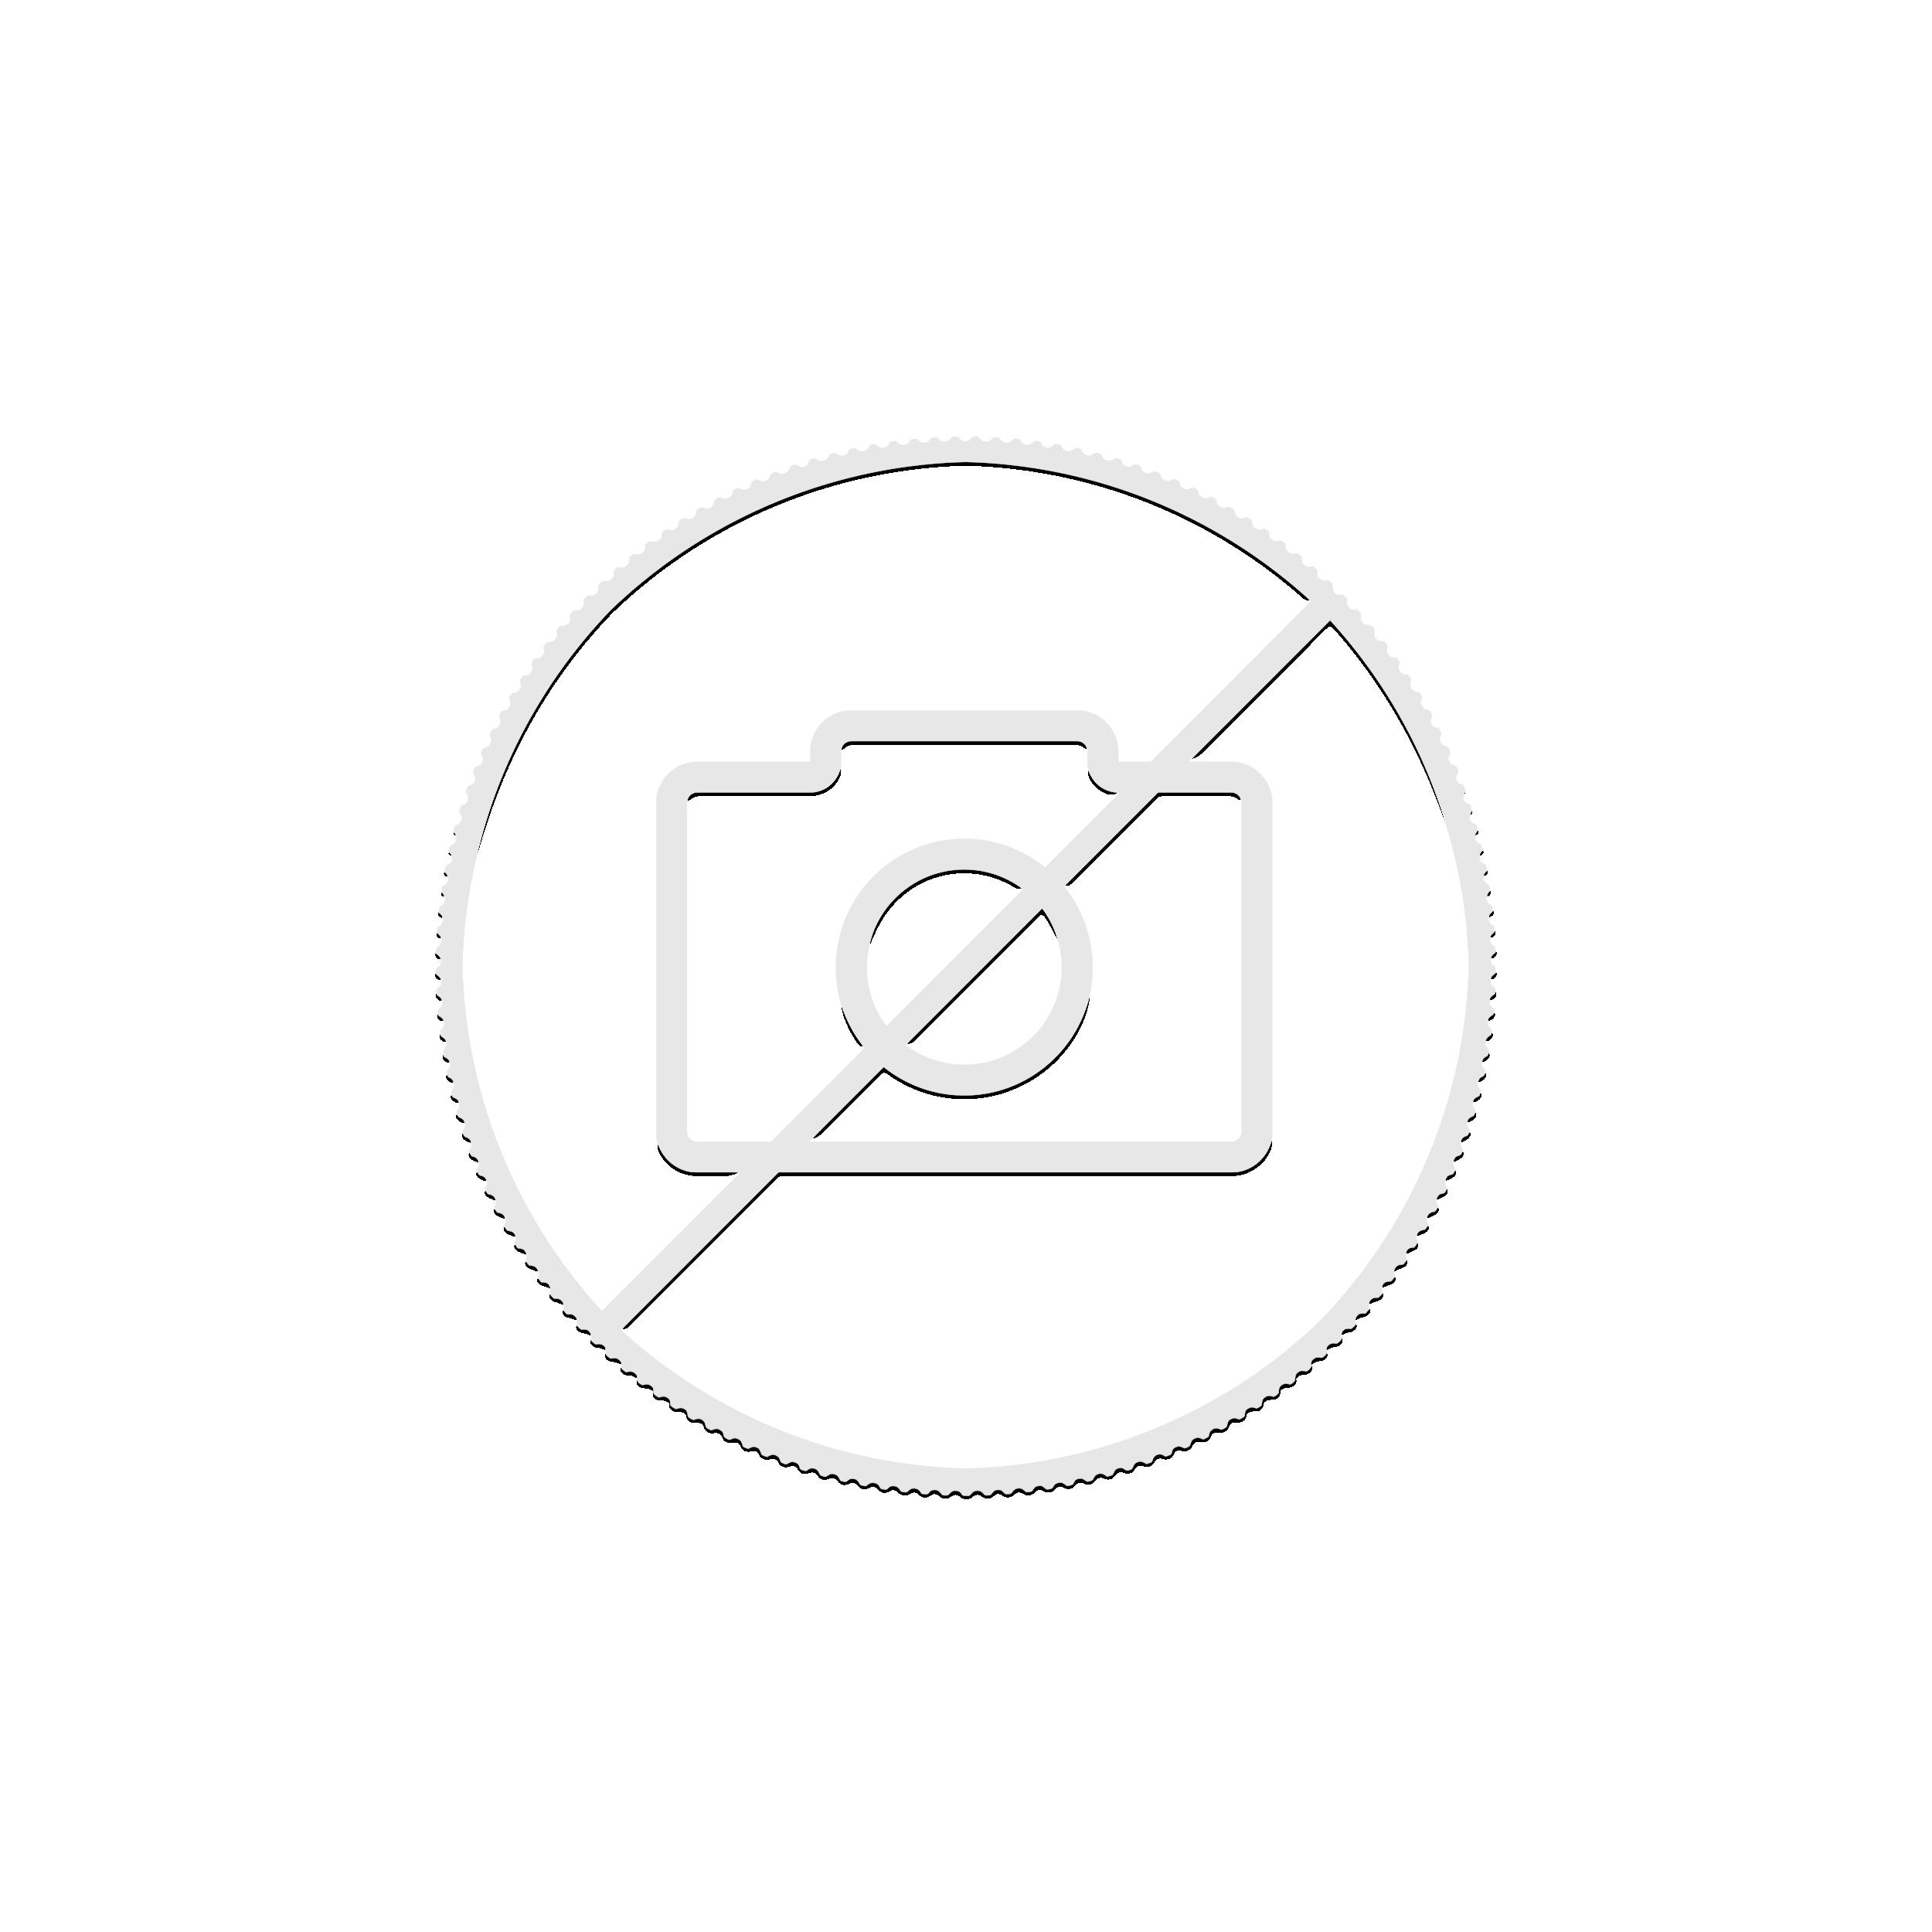 Goldbar Credit Suisse - 1 troy ounce gold